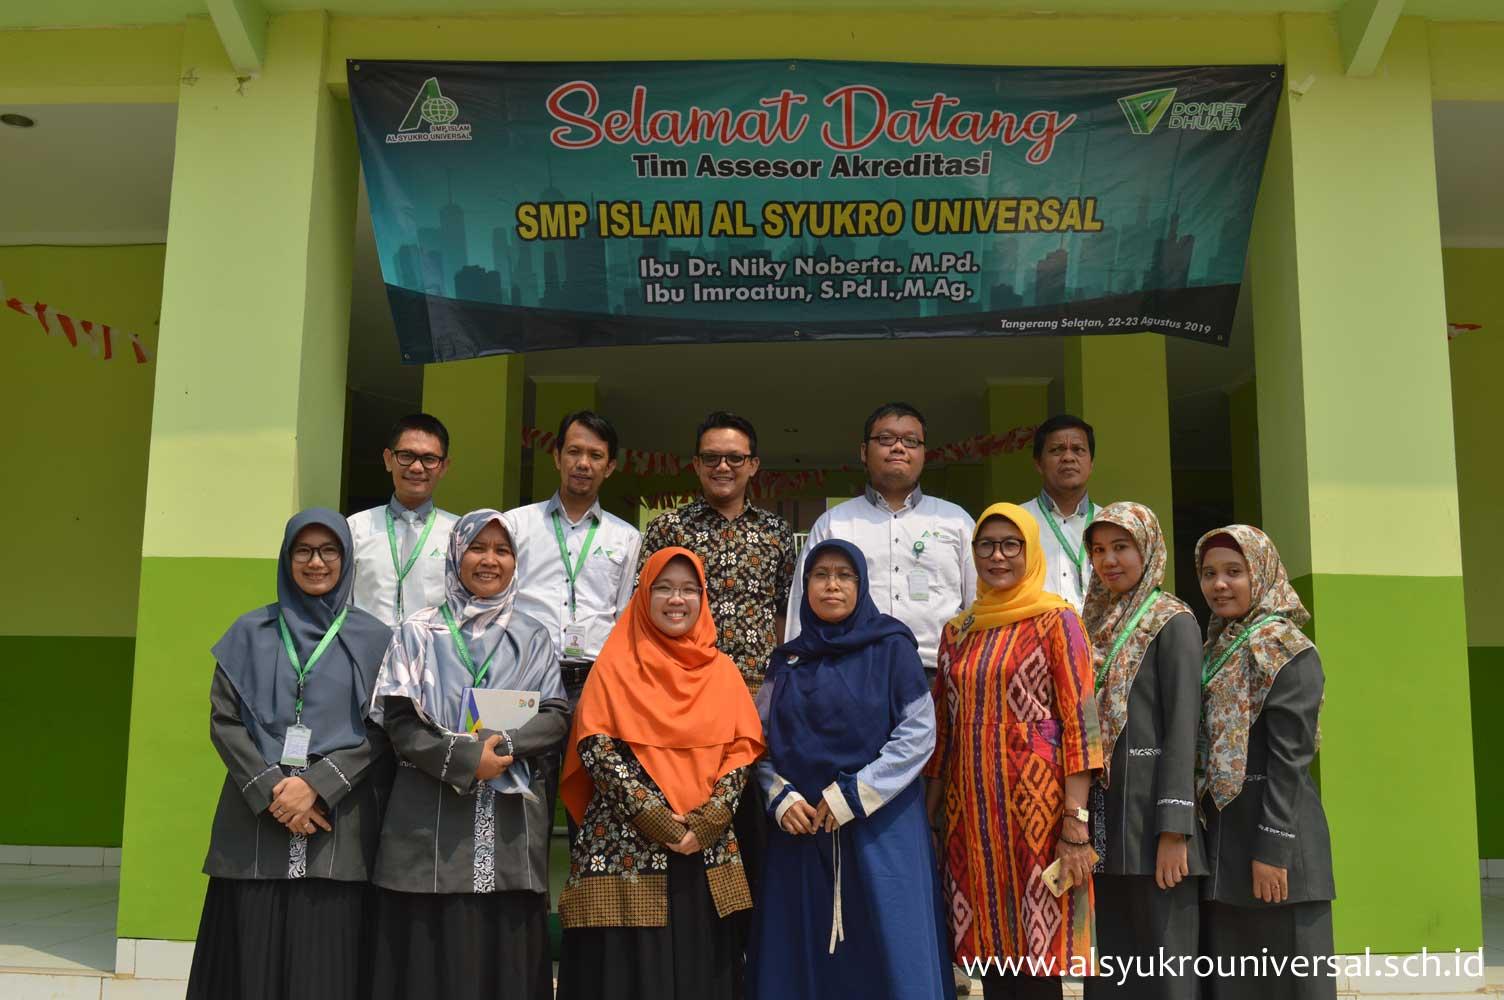 Akreditasi SMP Islam Al Syukro Universal